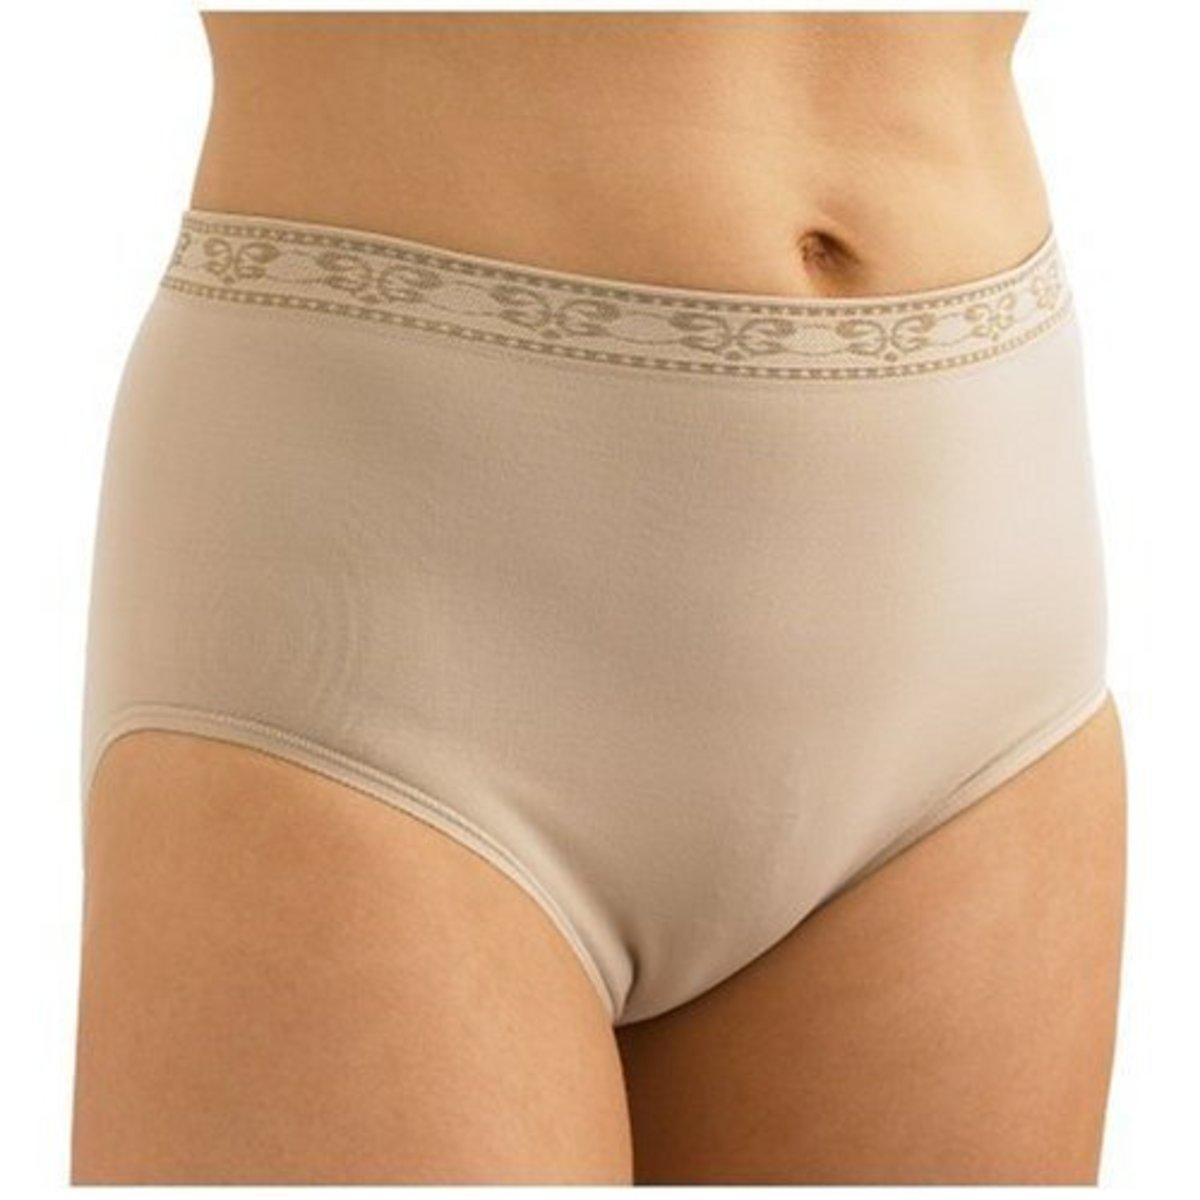 feel-good-panties-vanity-fair-nylon-panties-for-men